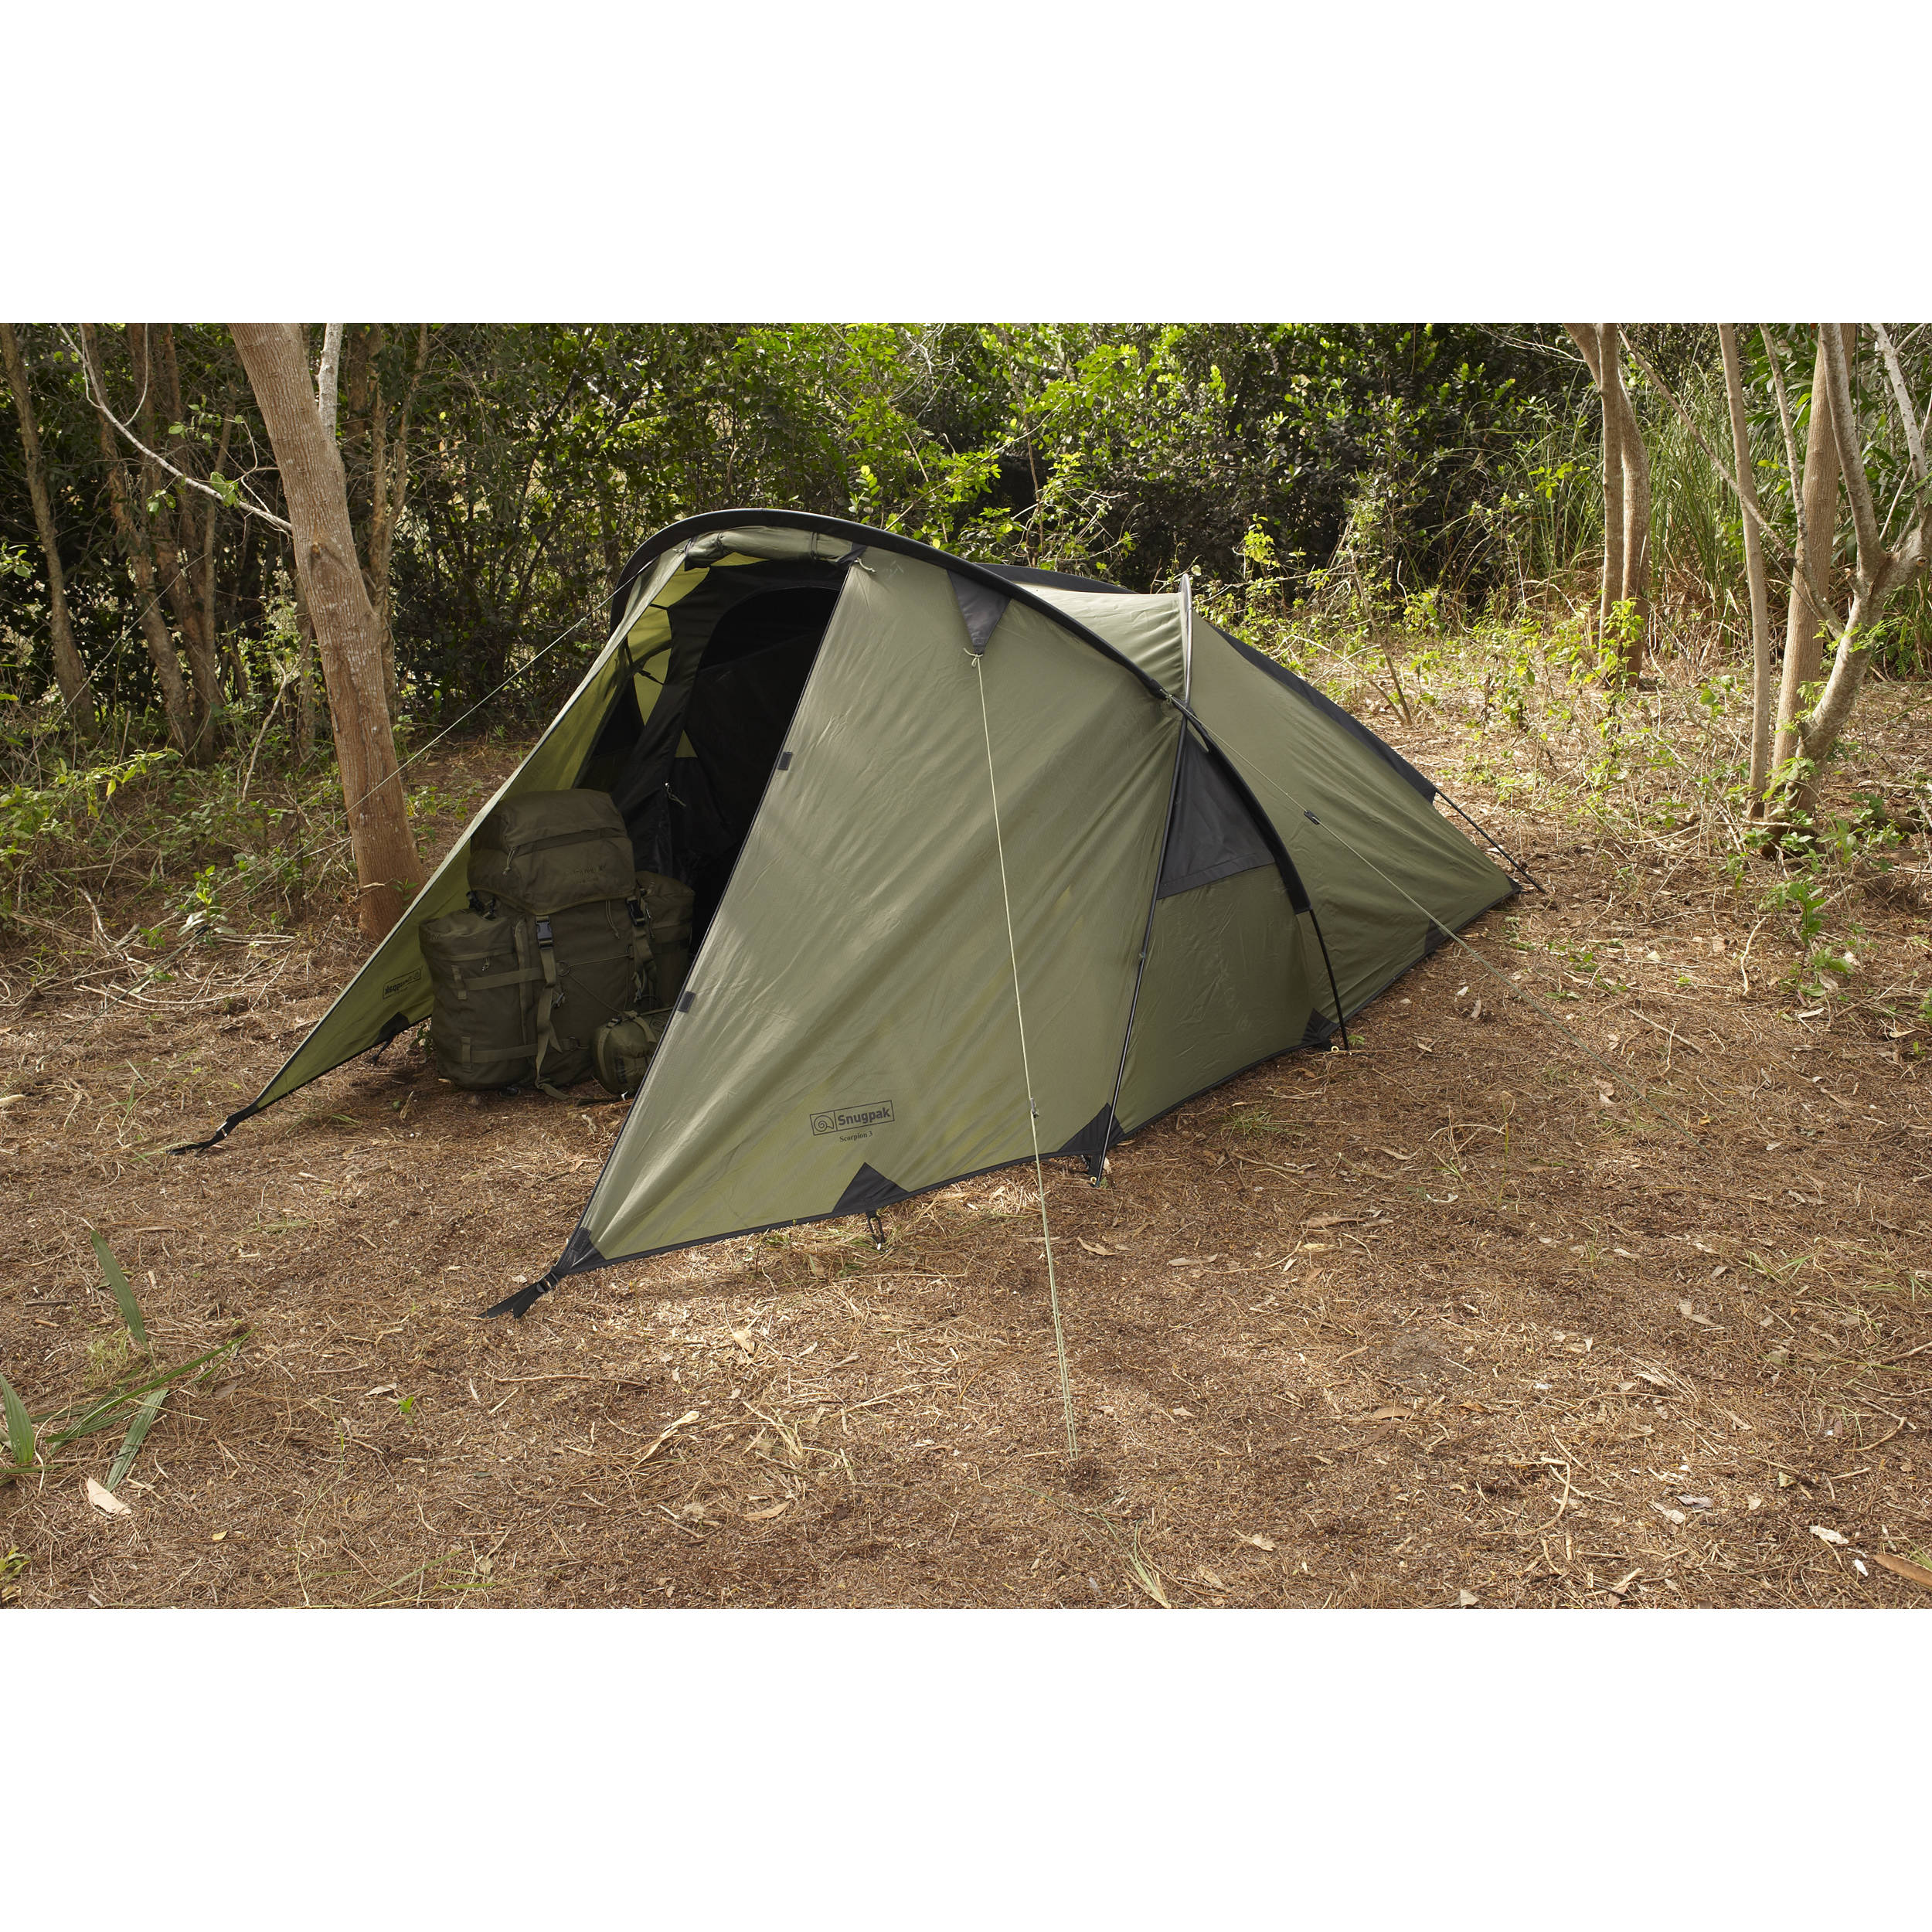 Snugpak Scorpion 3-Person Tent (Olive)  sc 1 st  Bu0026H & Snugpak Scorpion 3-Person Tent (Olive) 92880 Bu0026H Photo Video